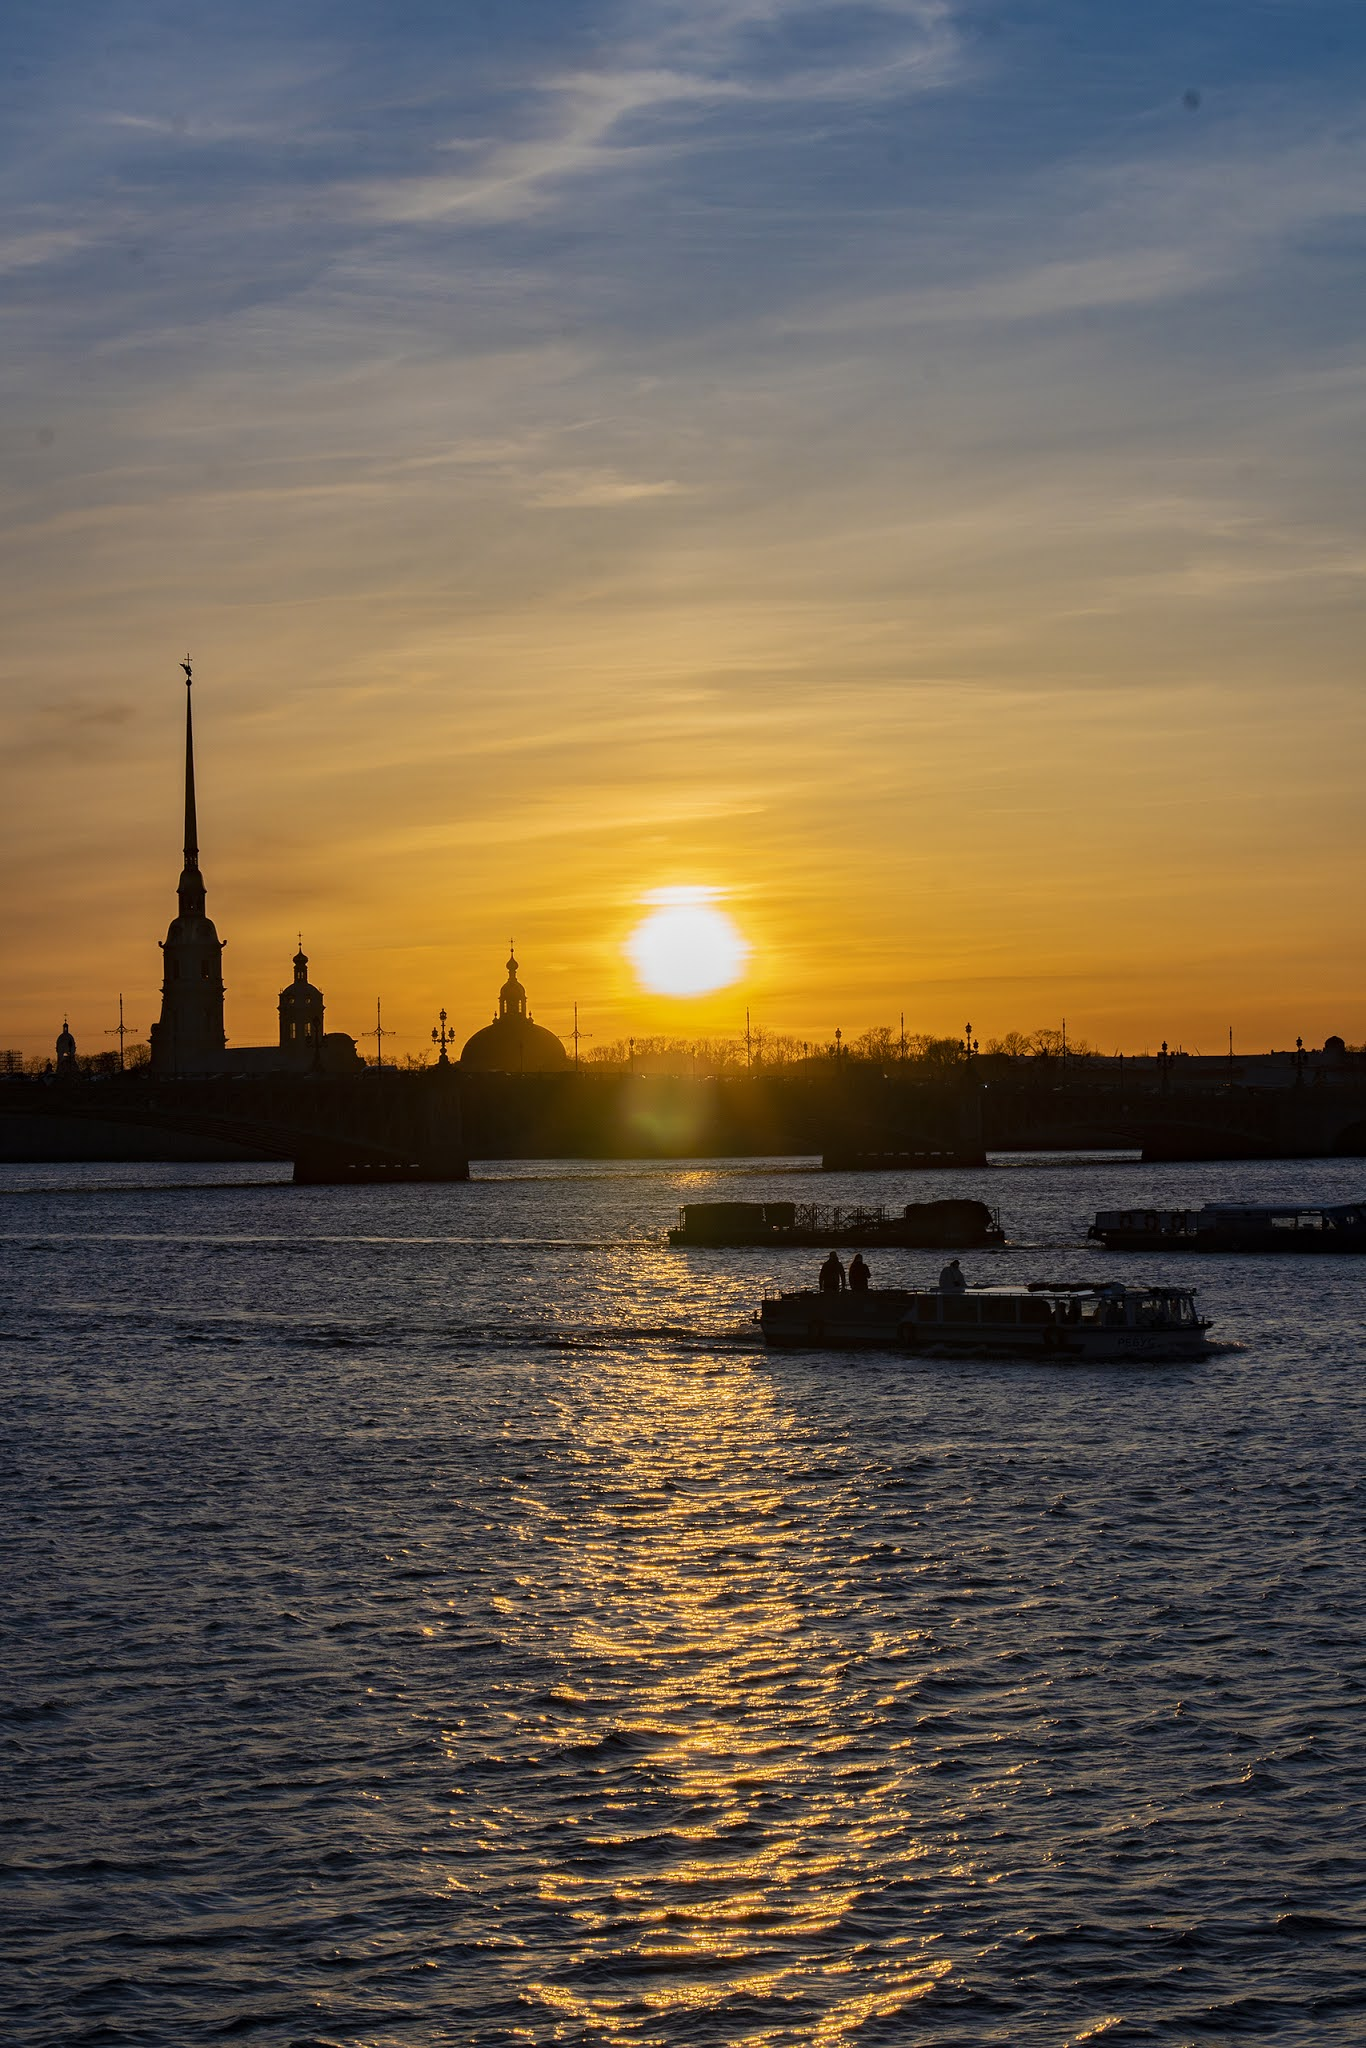 Photo by Igor Novik St. Petersburg Neva sunset sky river sun ships